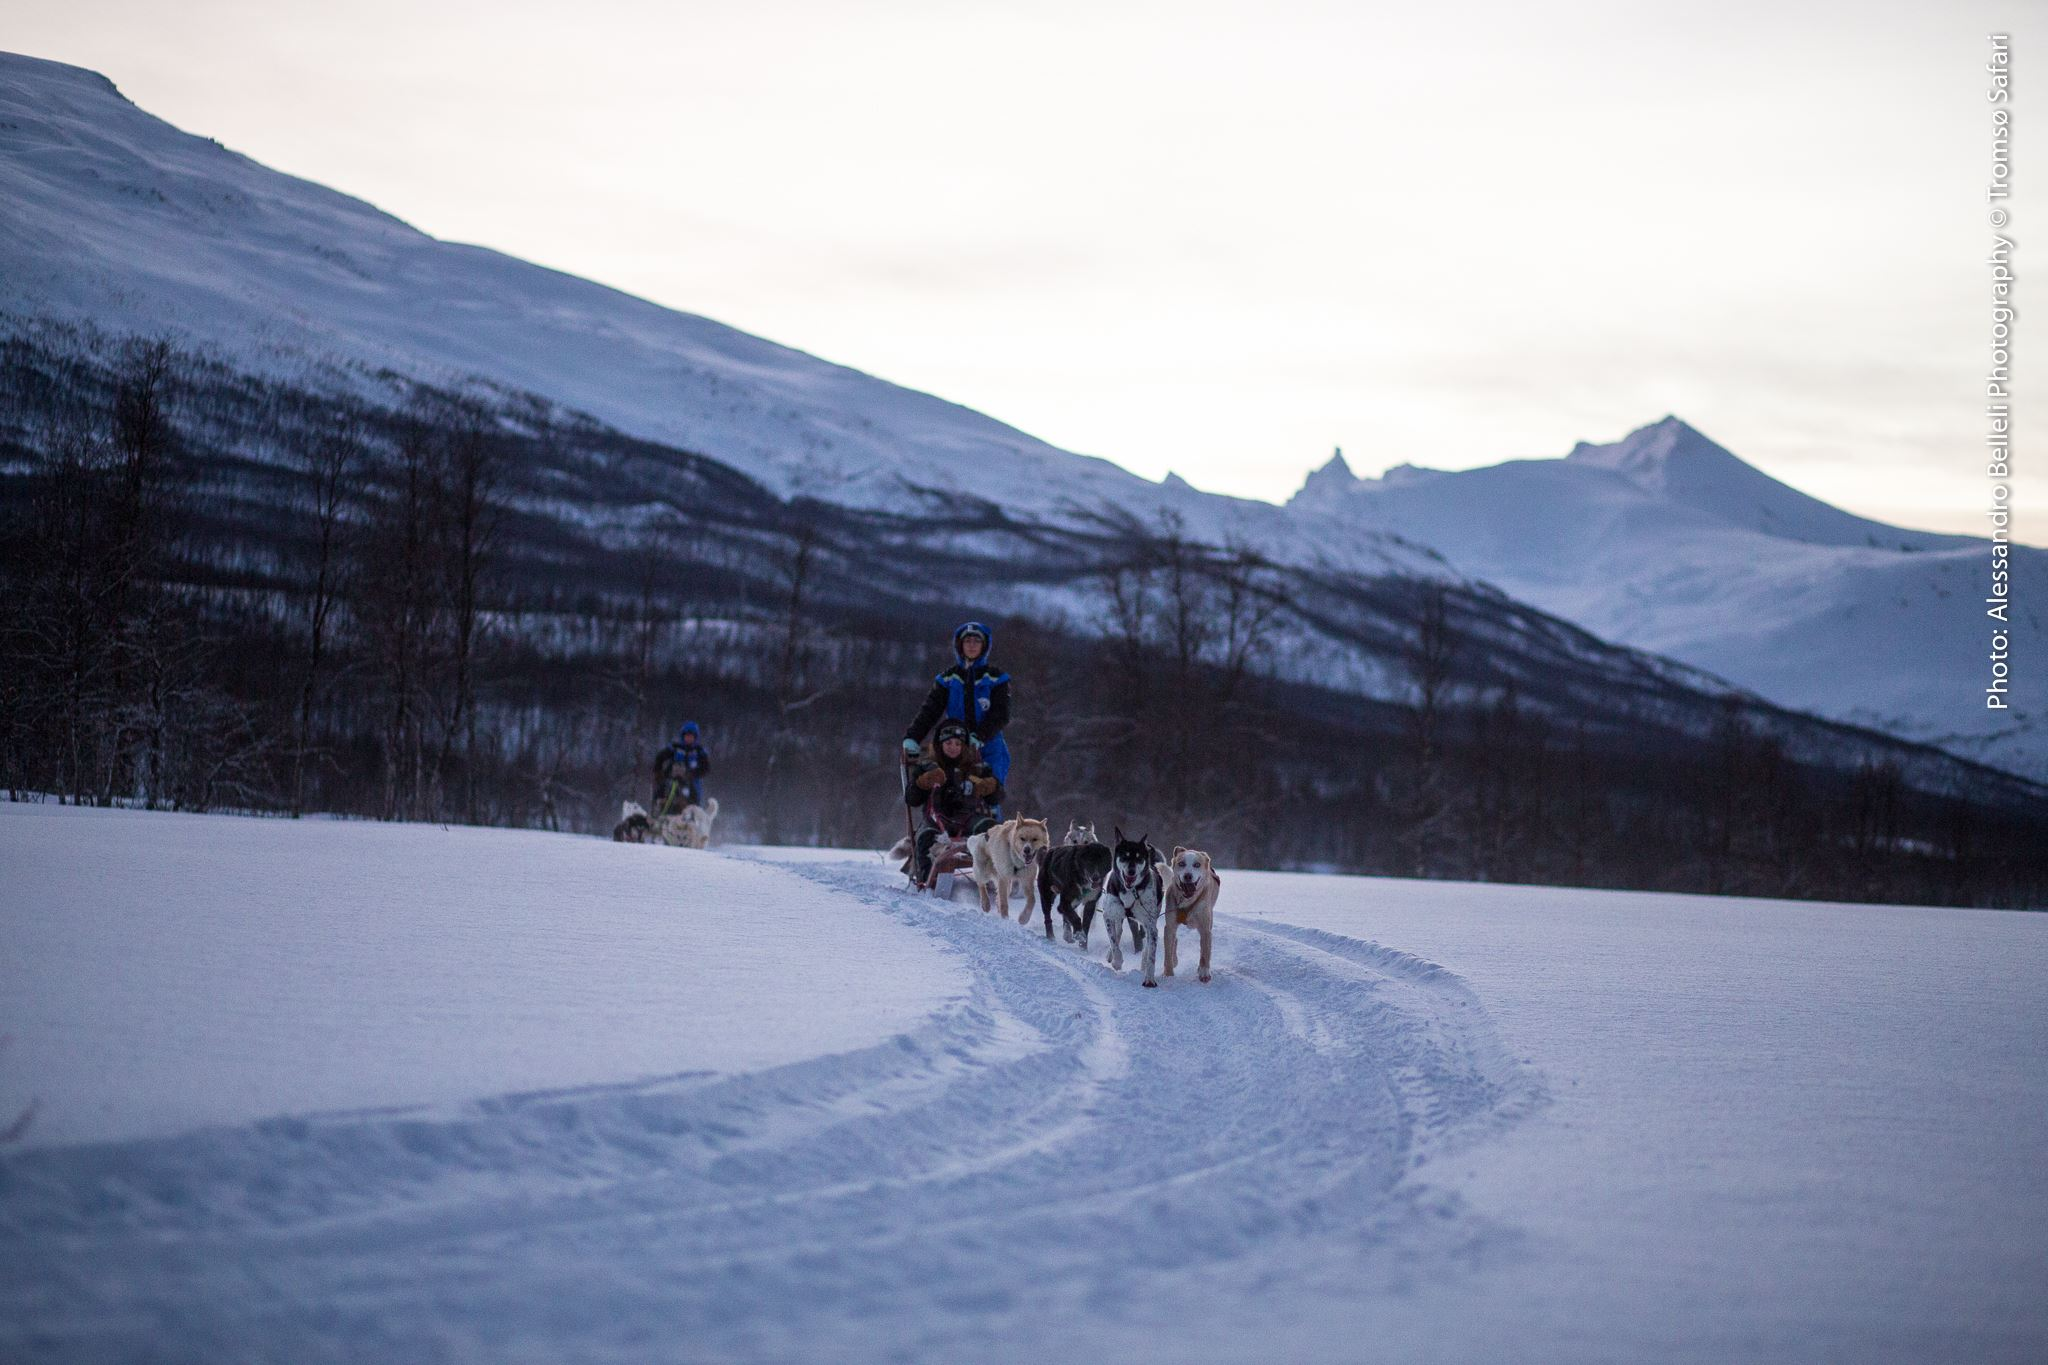 Huskysafari - Tromsø Safari